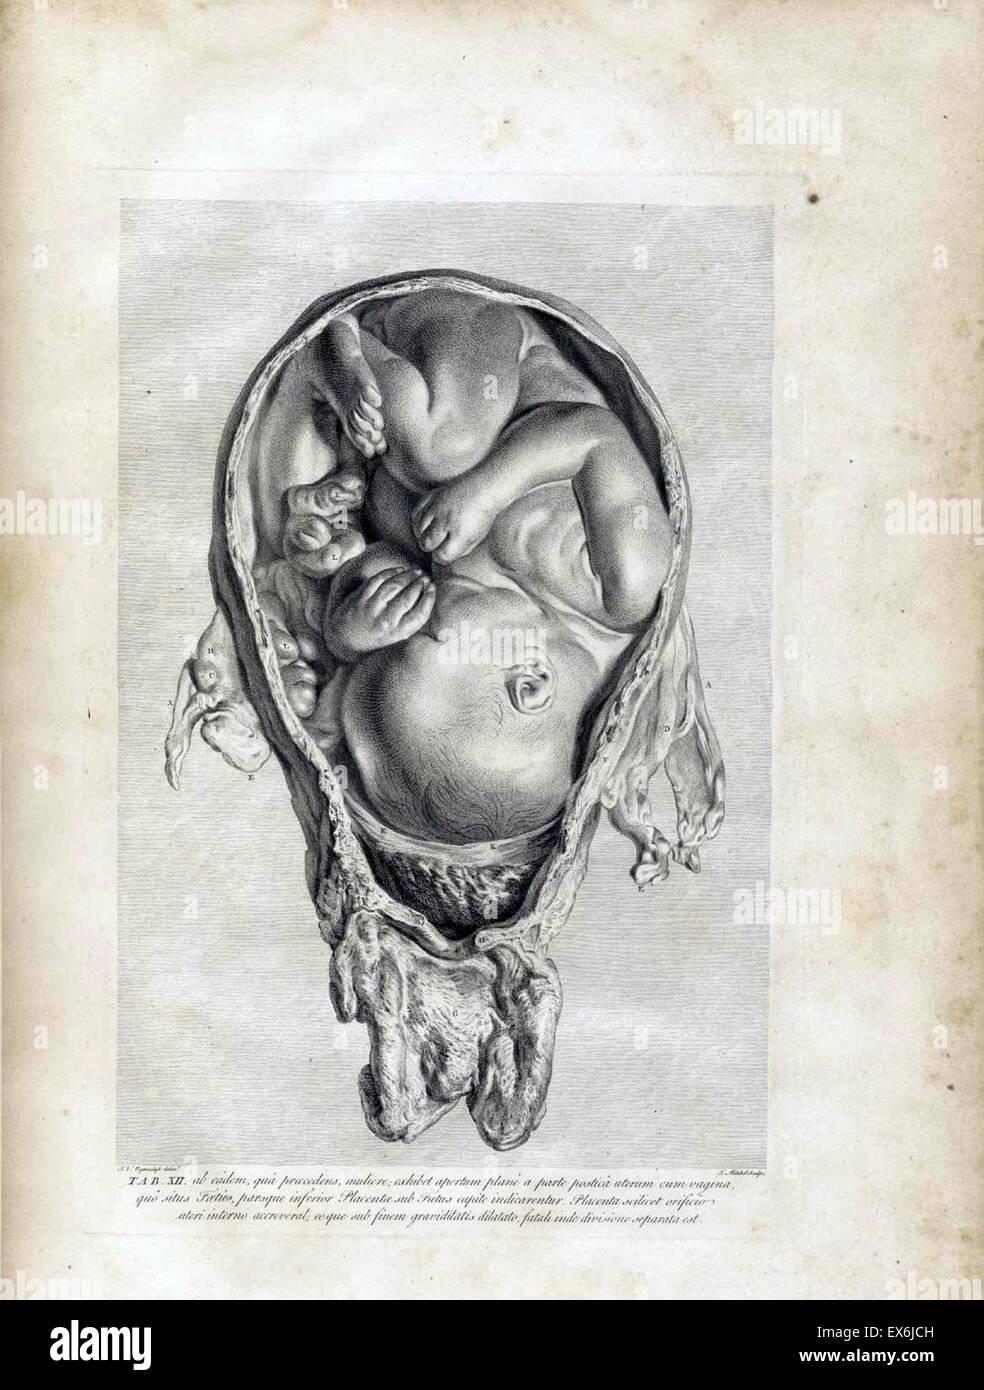 Anatomia Stock Photos & Anatomia Stock Images - Page 2 - Alamy